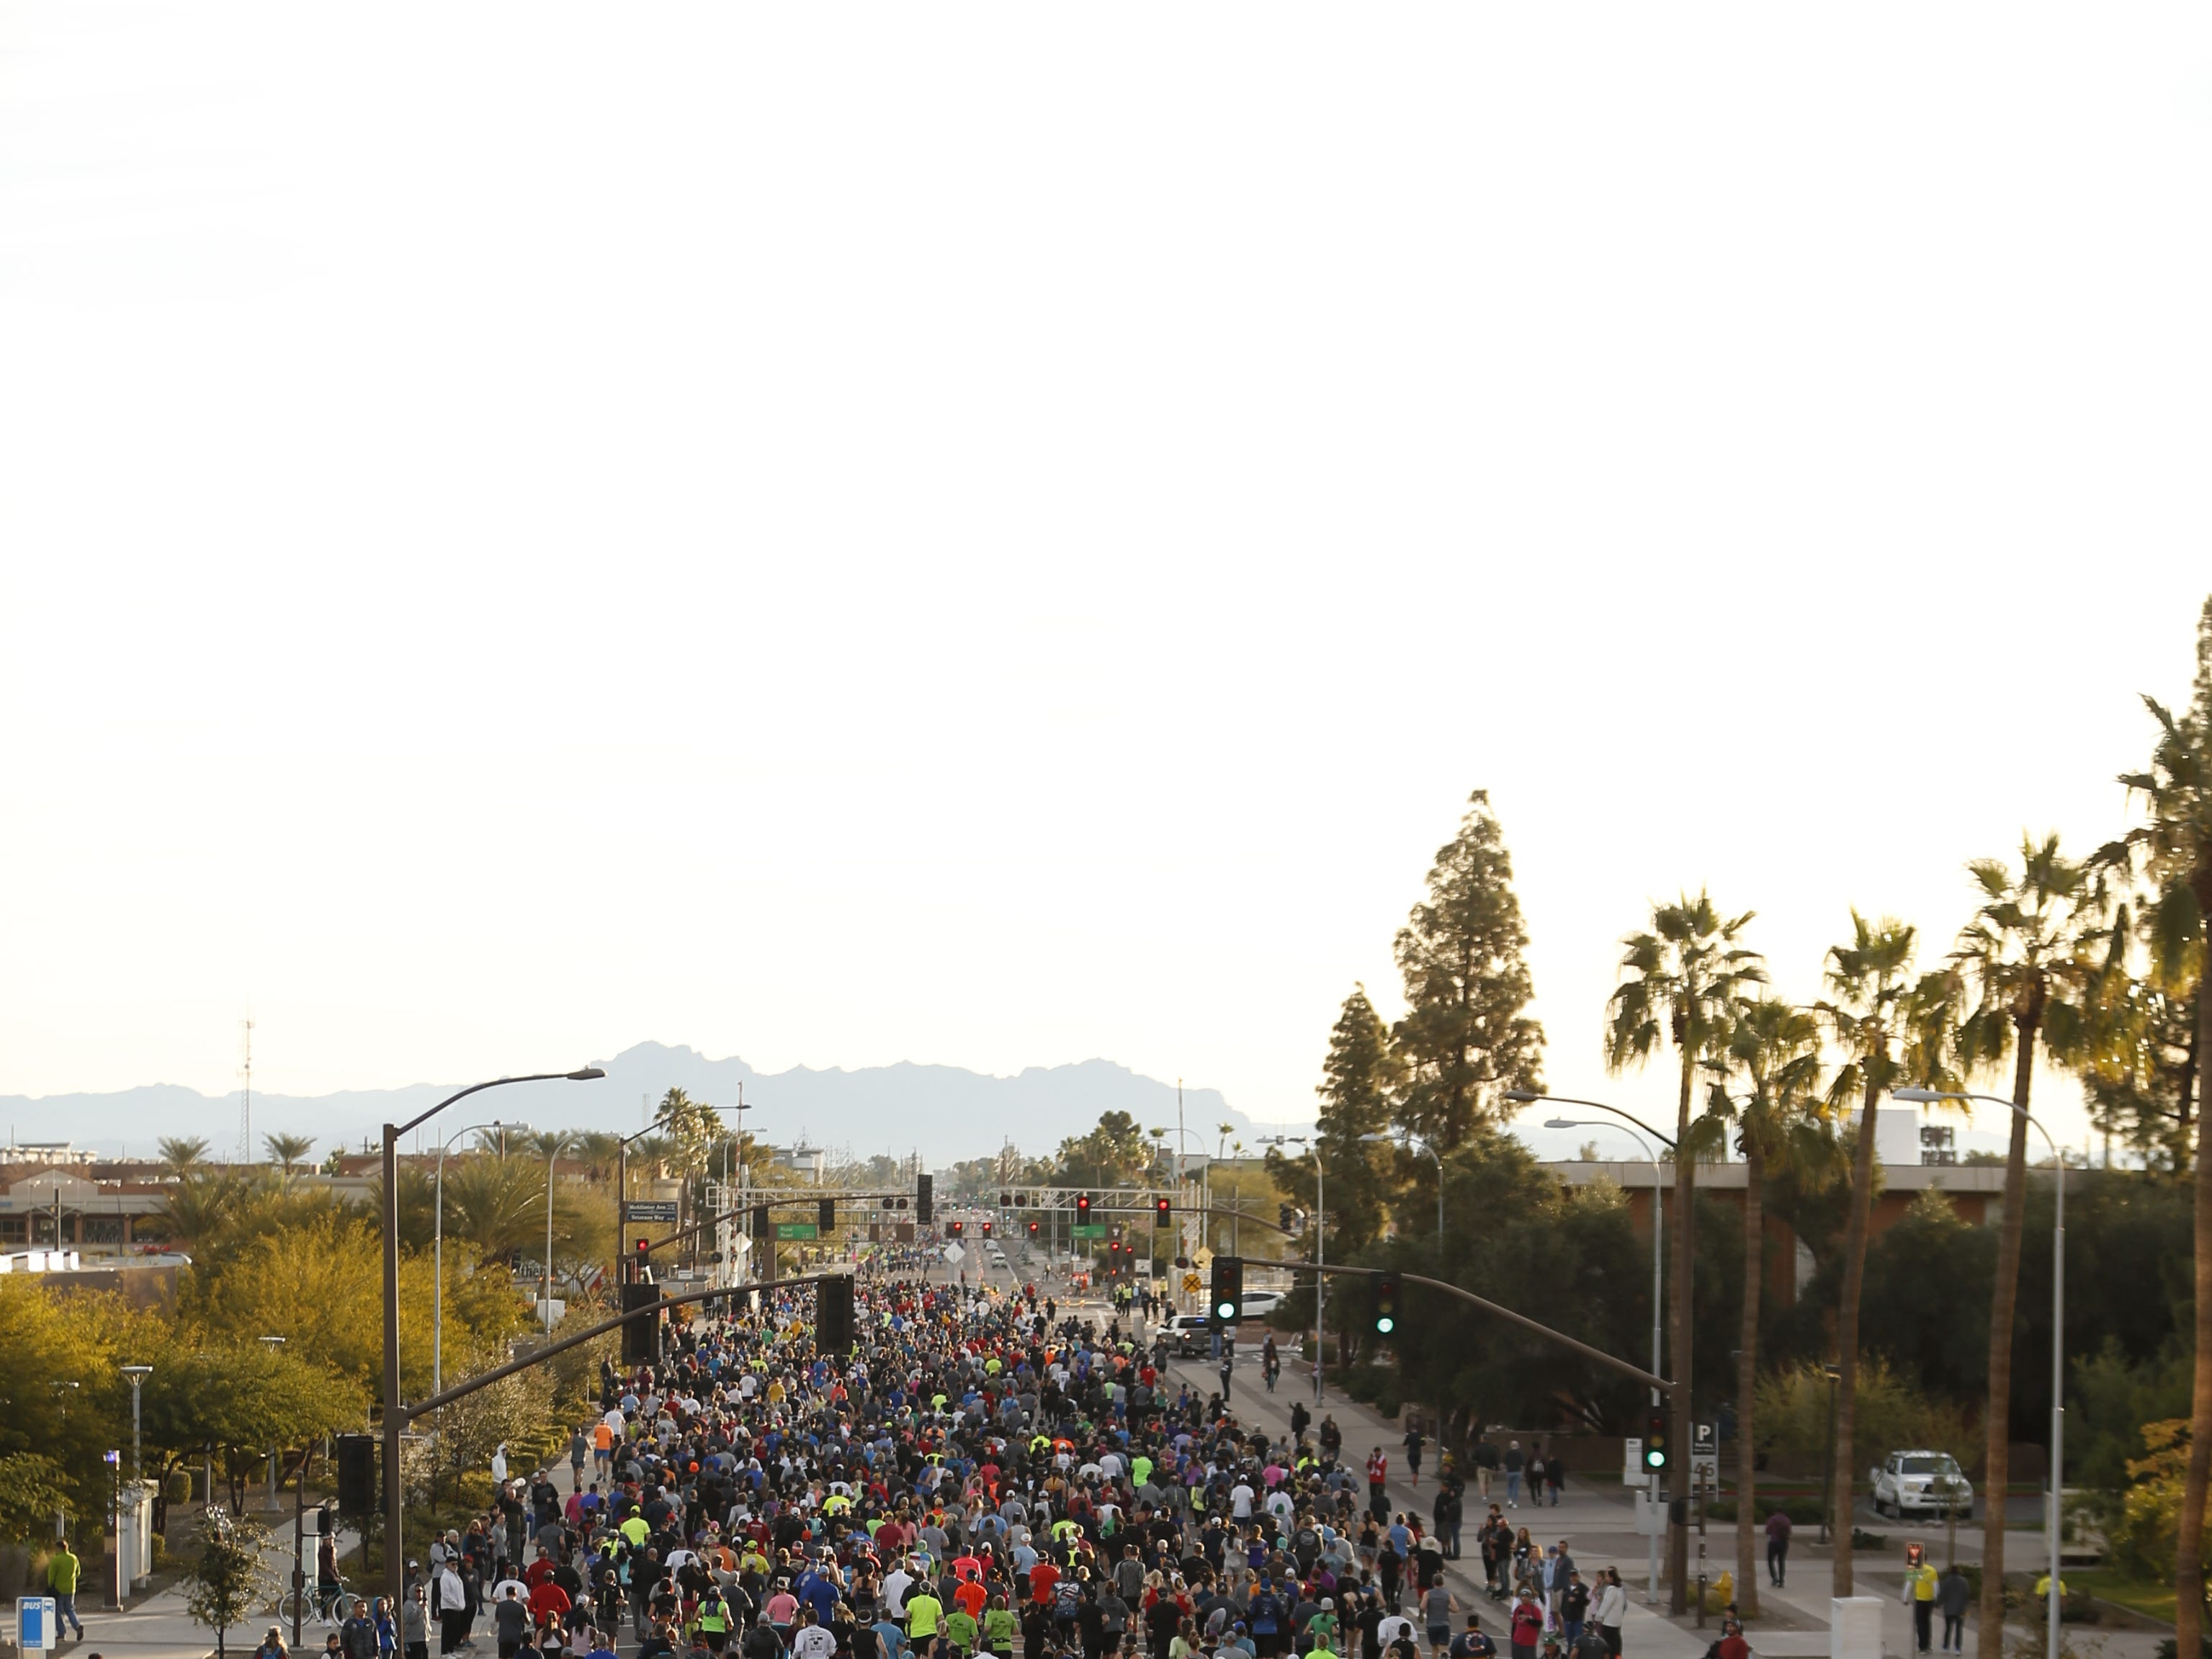 People make their way down University Street during the Rock 'N' Roll half-marathon in Tempe on Jan. 20, 2019.